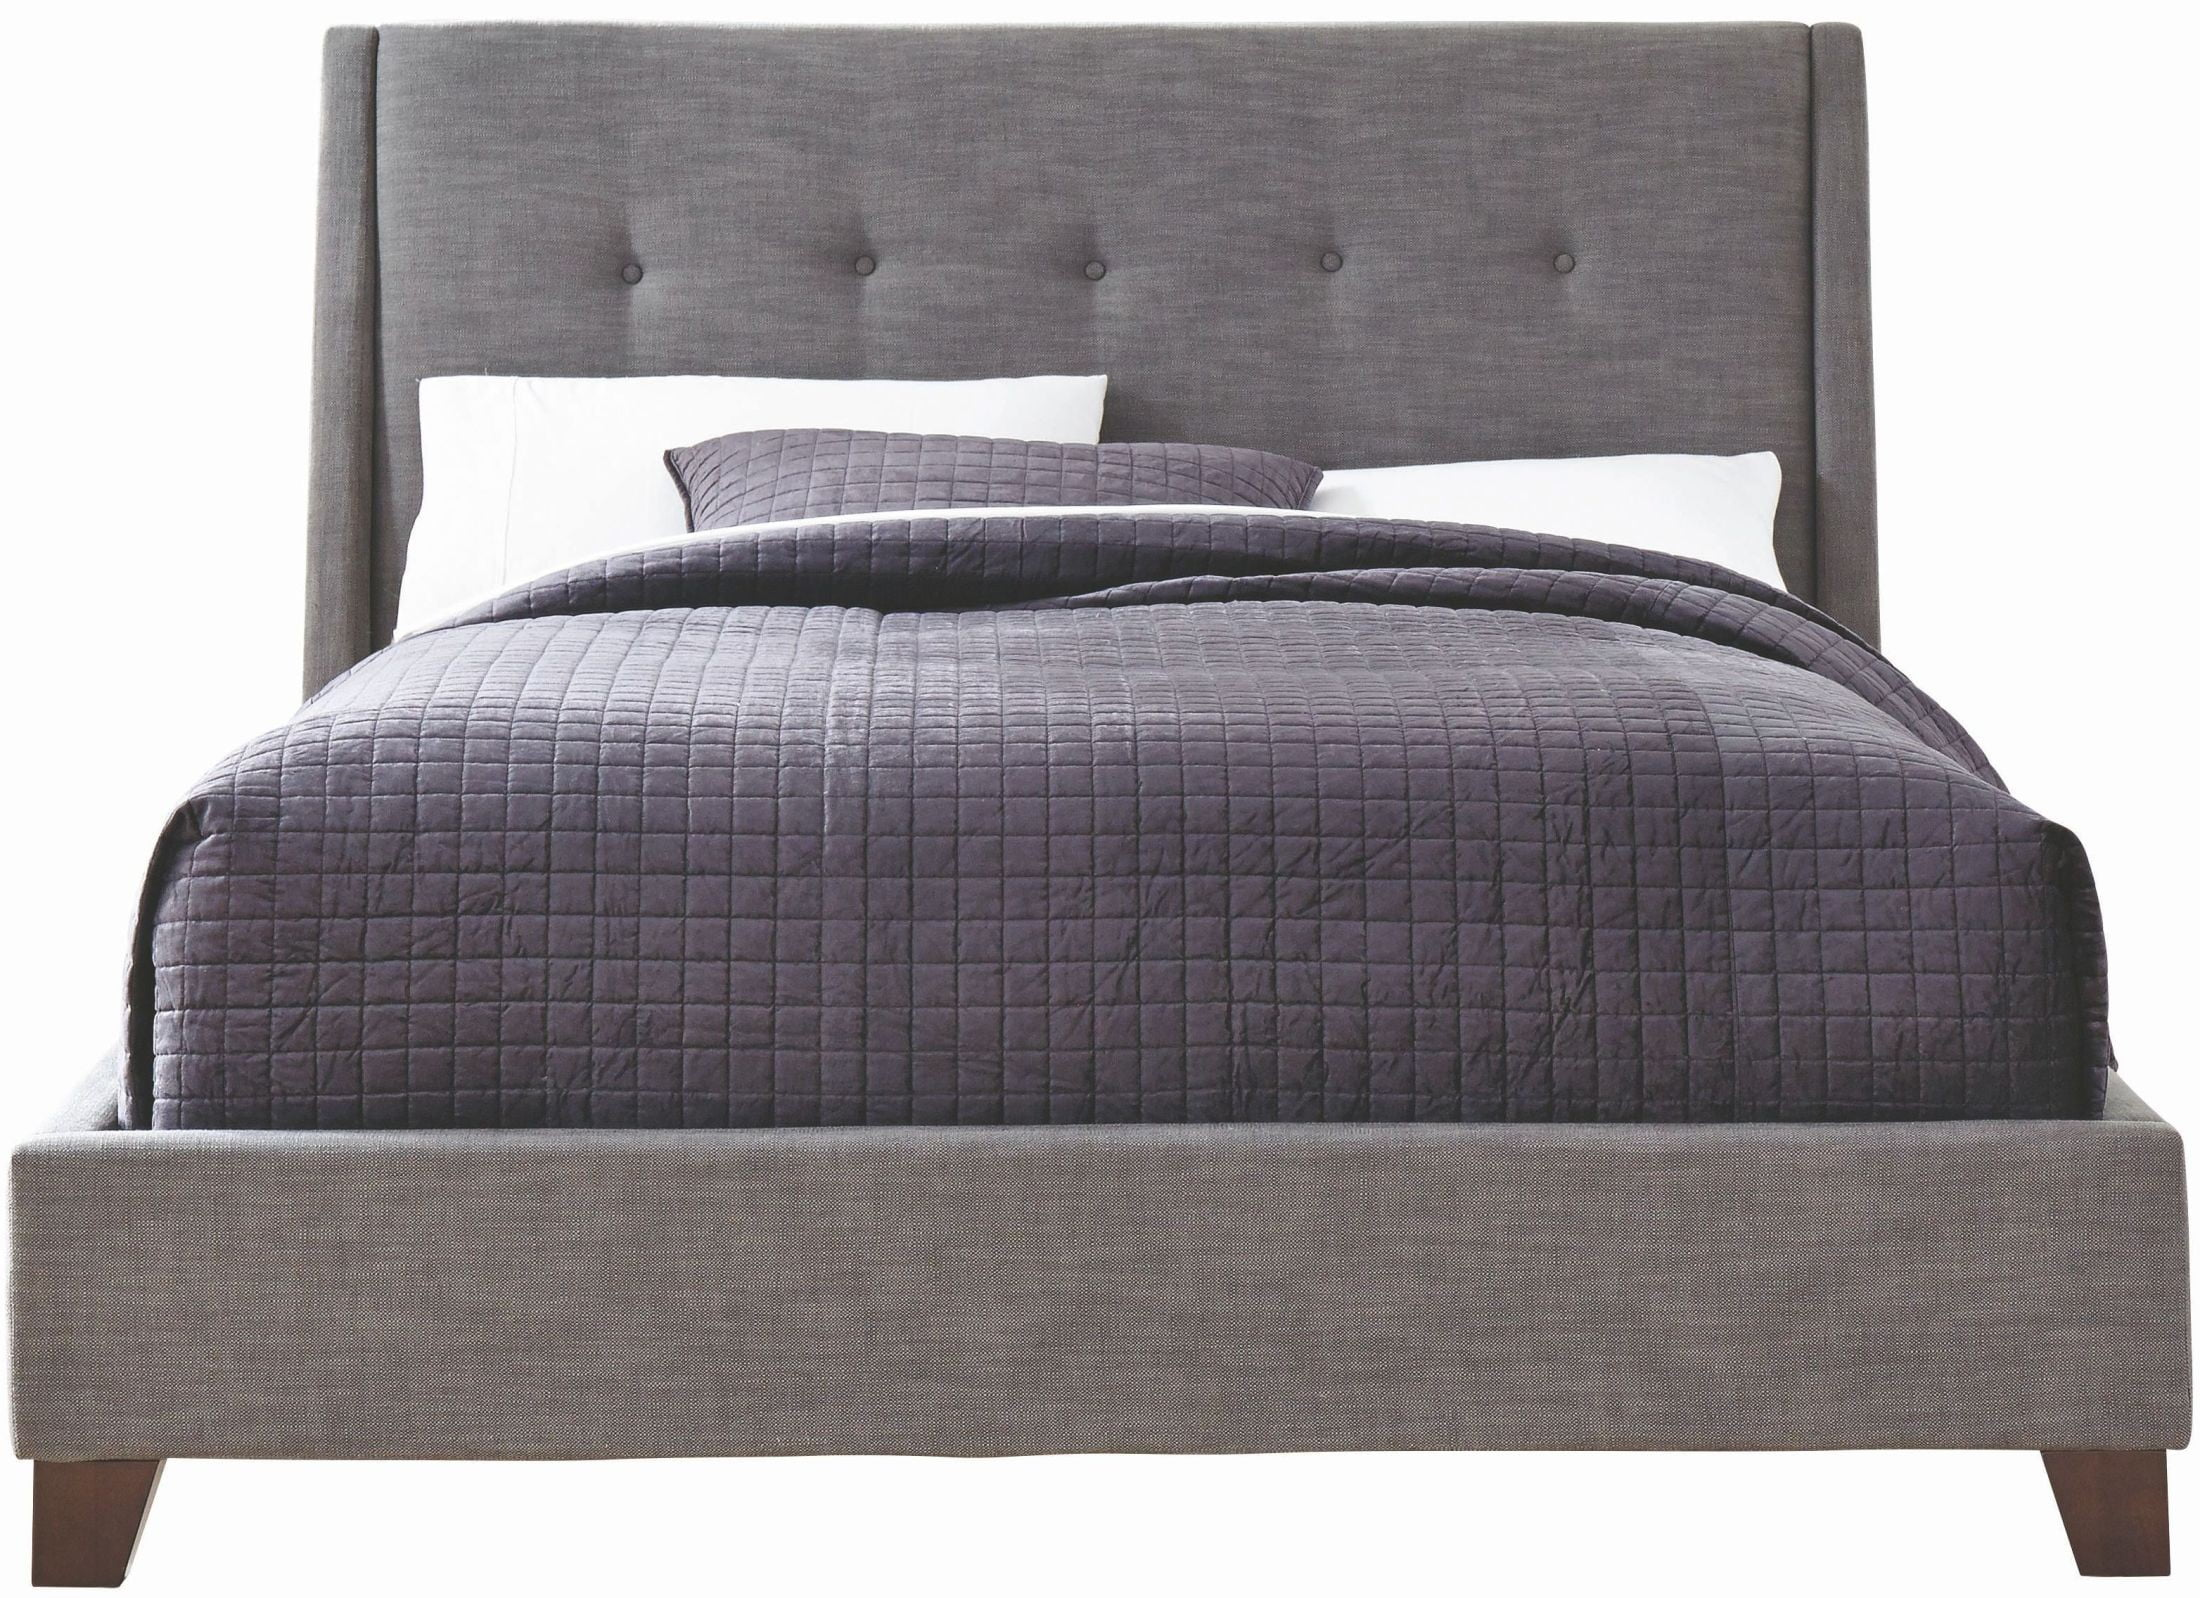 ballard dark gray queen upholstered bed from casana | coleman furniture